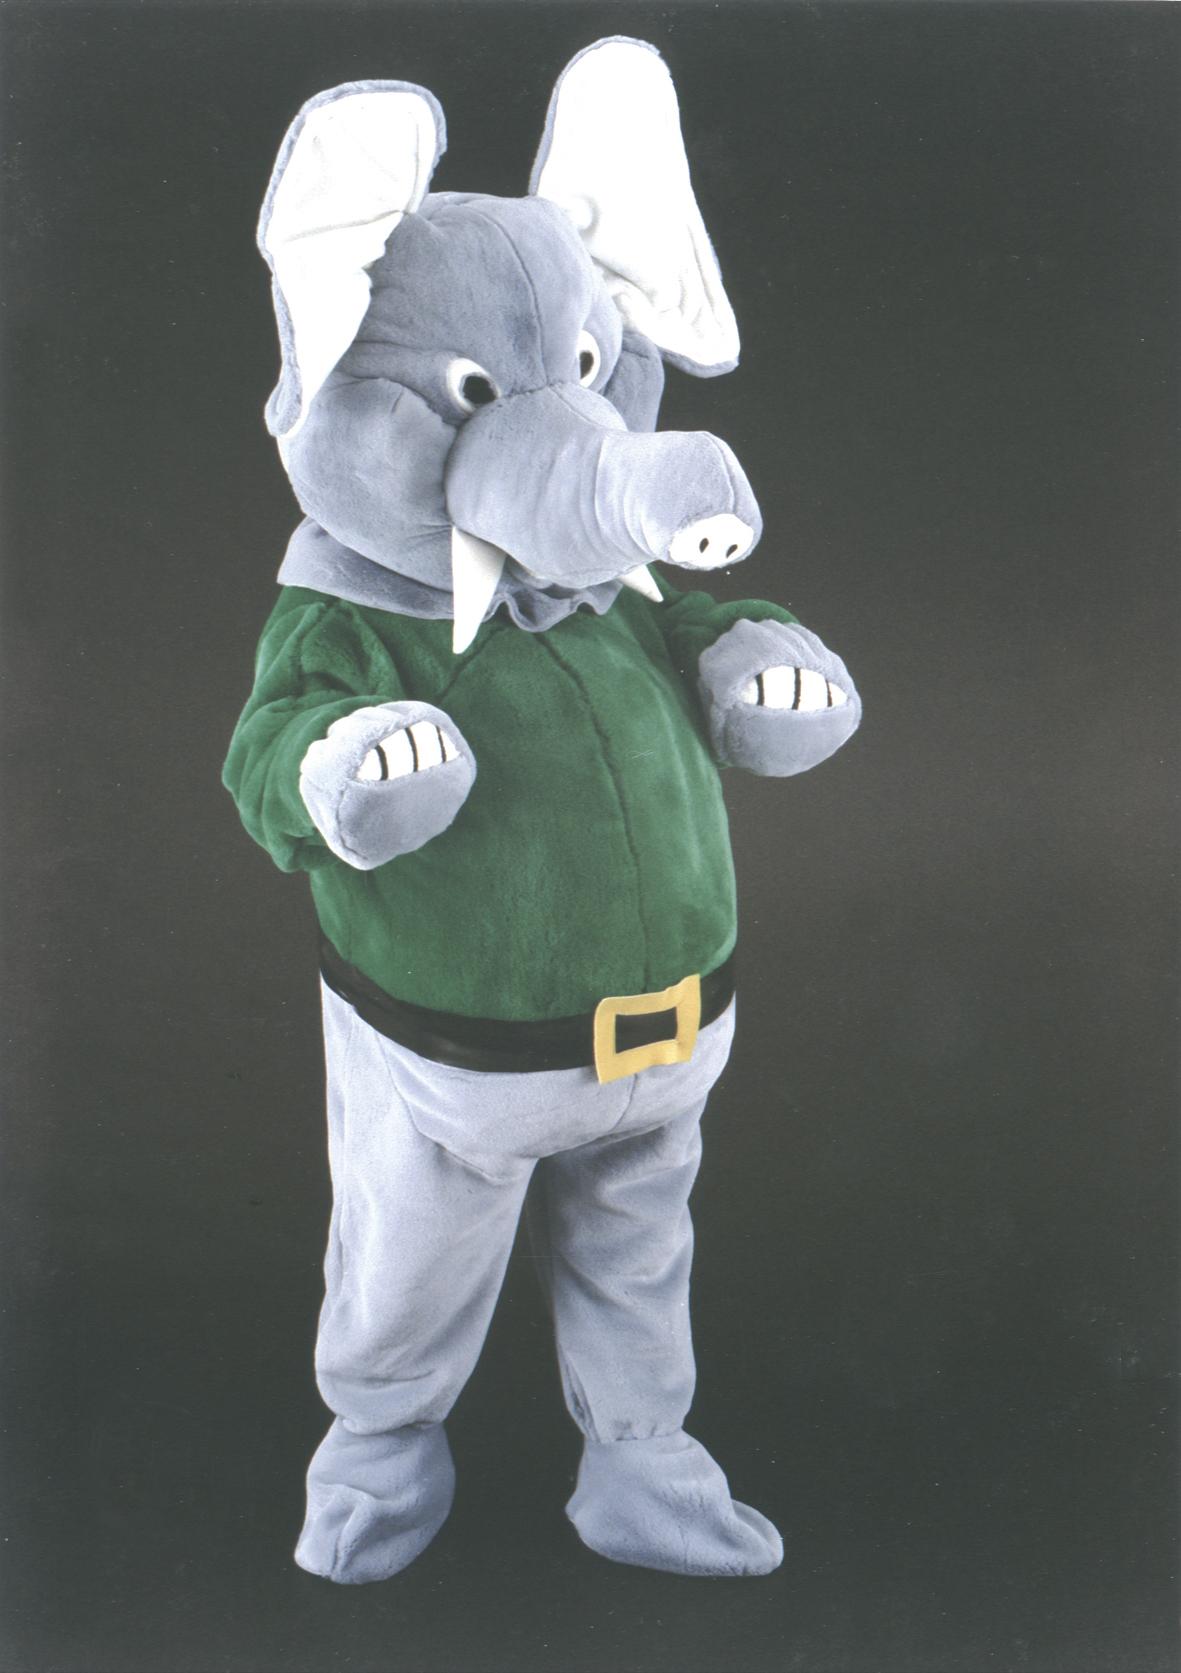 kost m elefant maskottchen 30a hochwertig maskottchen kost me t shirt schleuder f r jedes. Black Bedroom Furniture Sets. Home Design Ideas